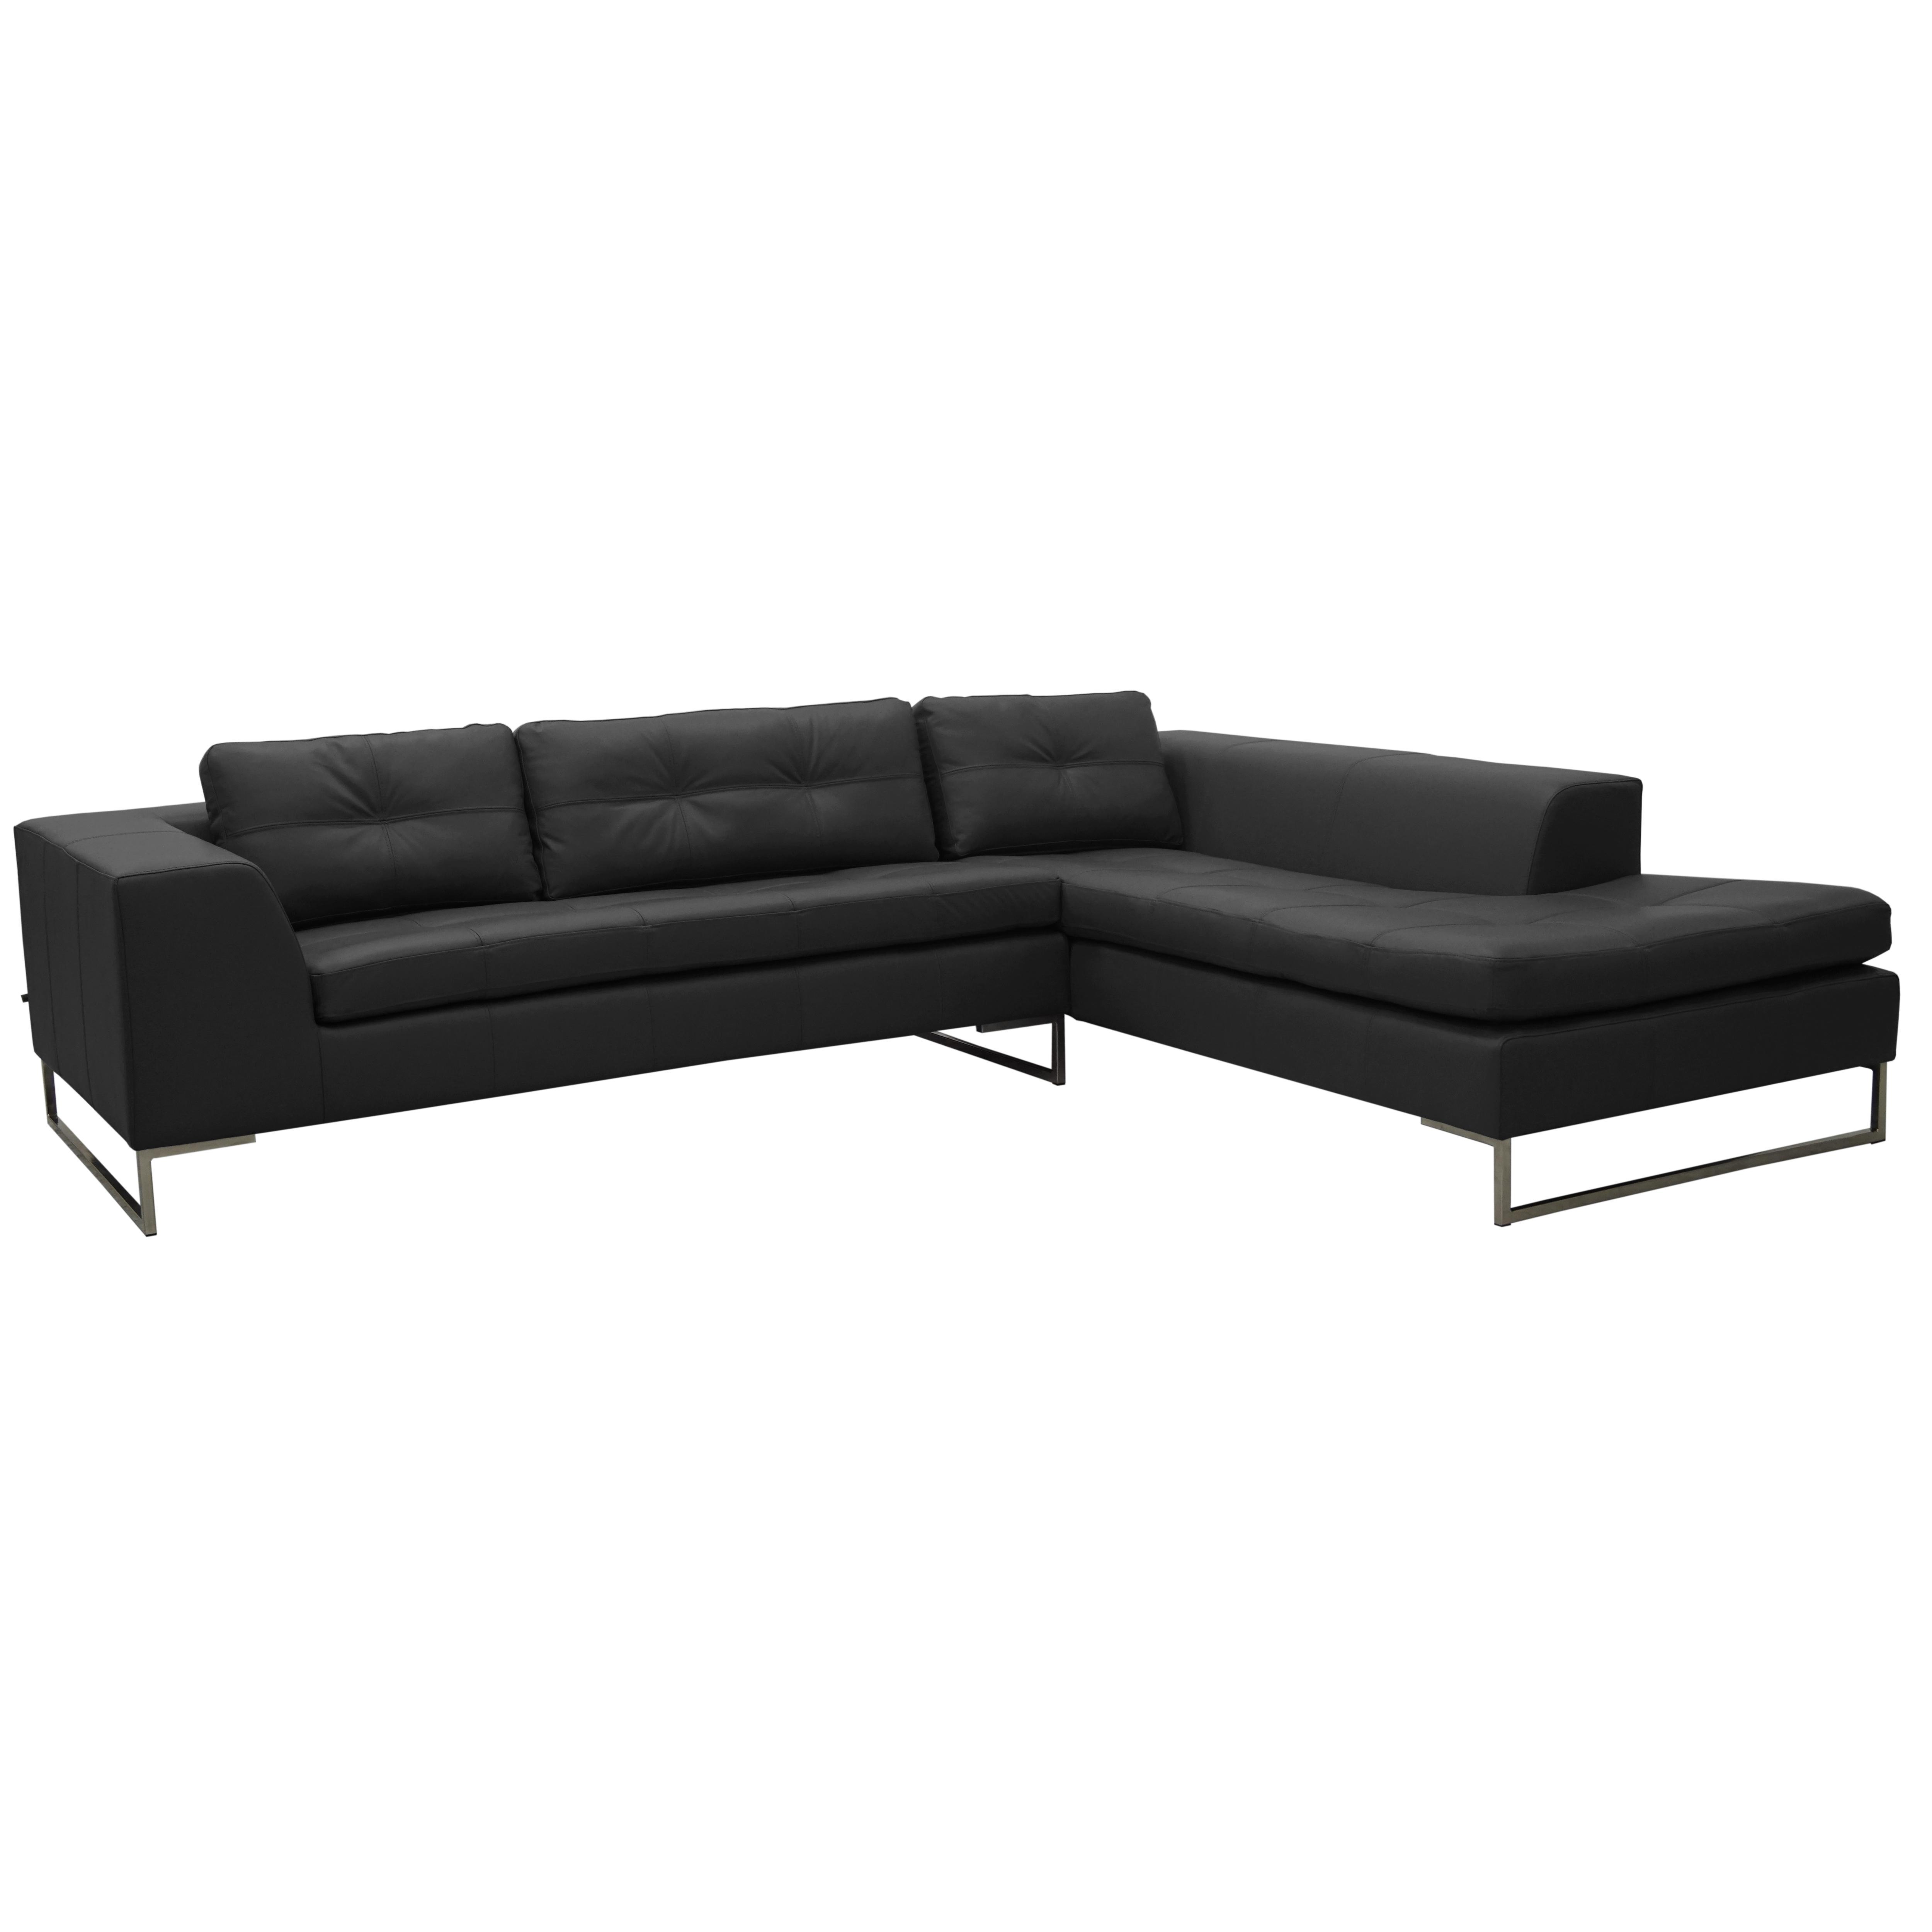 Toleda left hand facing arm corner sofa mollis leather ink black